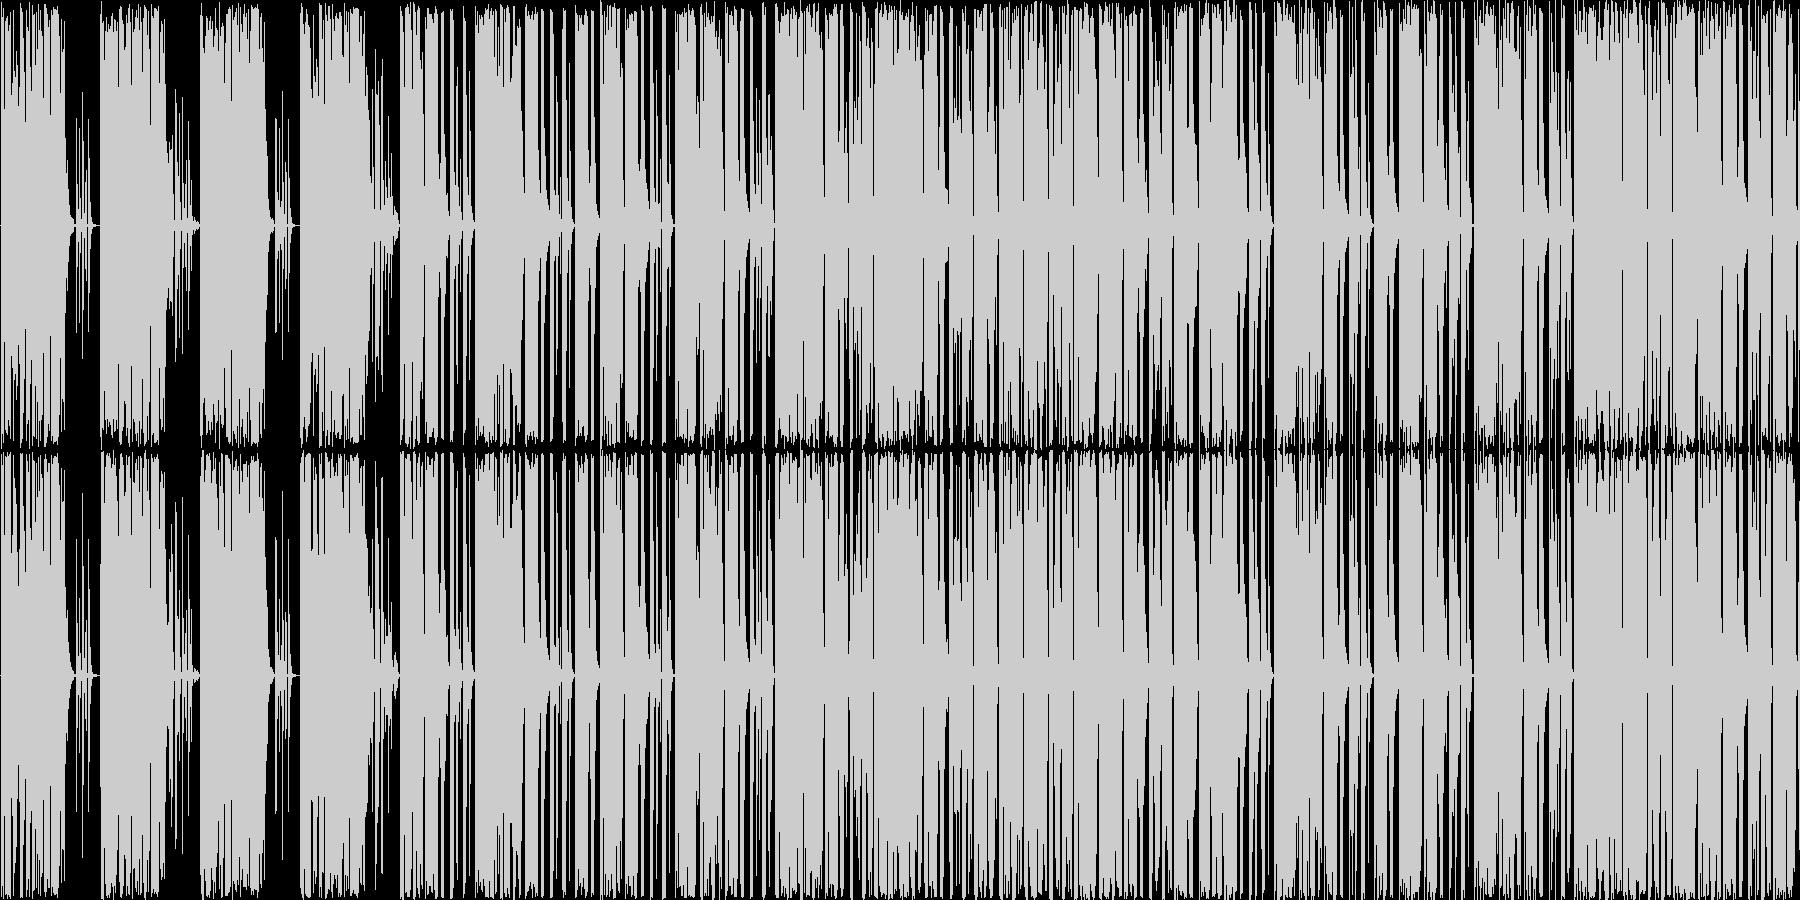 techonoですの未再生の波形